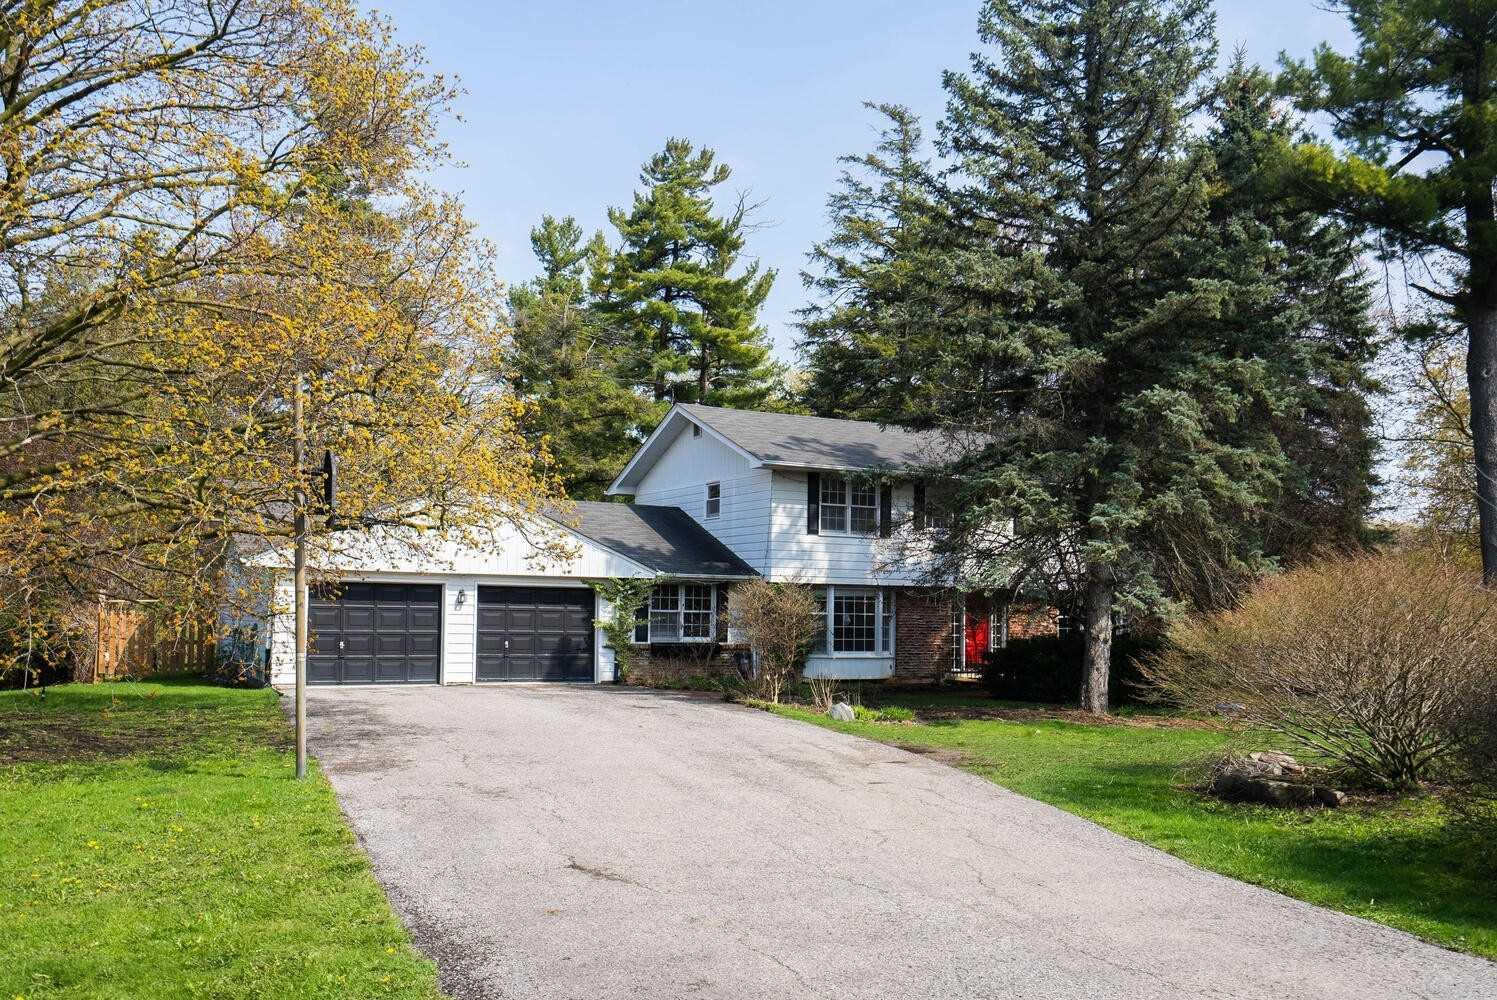 9795 Warden Ave, Markham Ontario, Canada